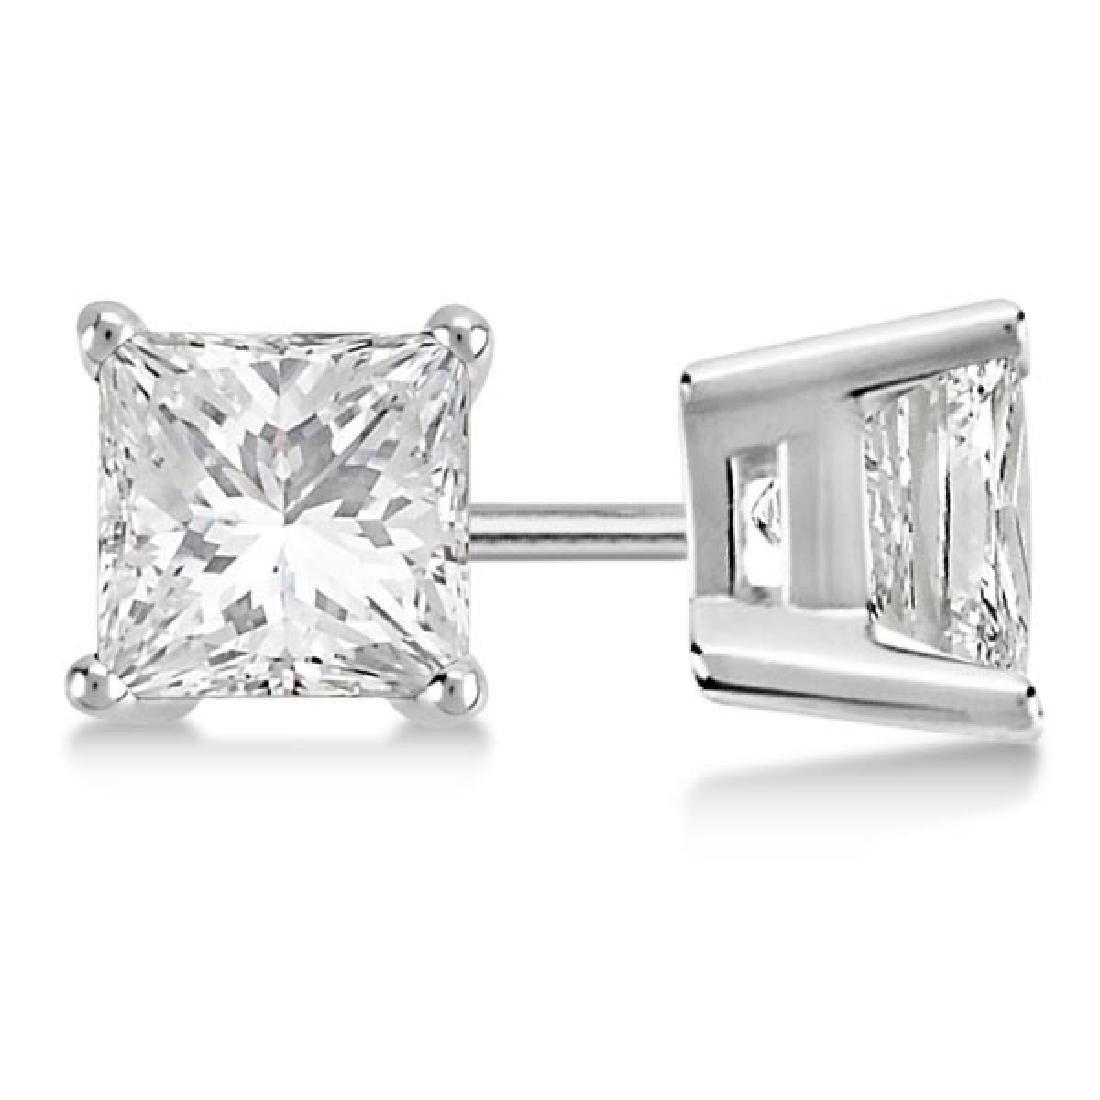 Certified 0.97 CTW Princess Diamond Stud Earrings D/SI3